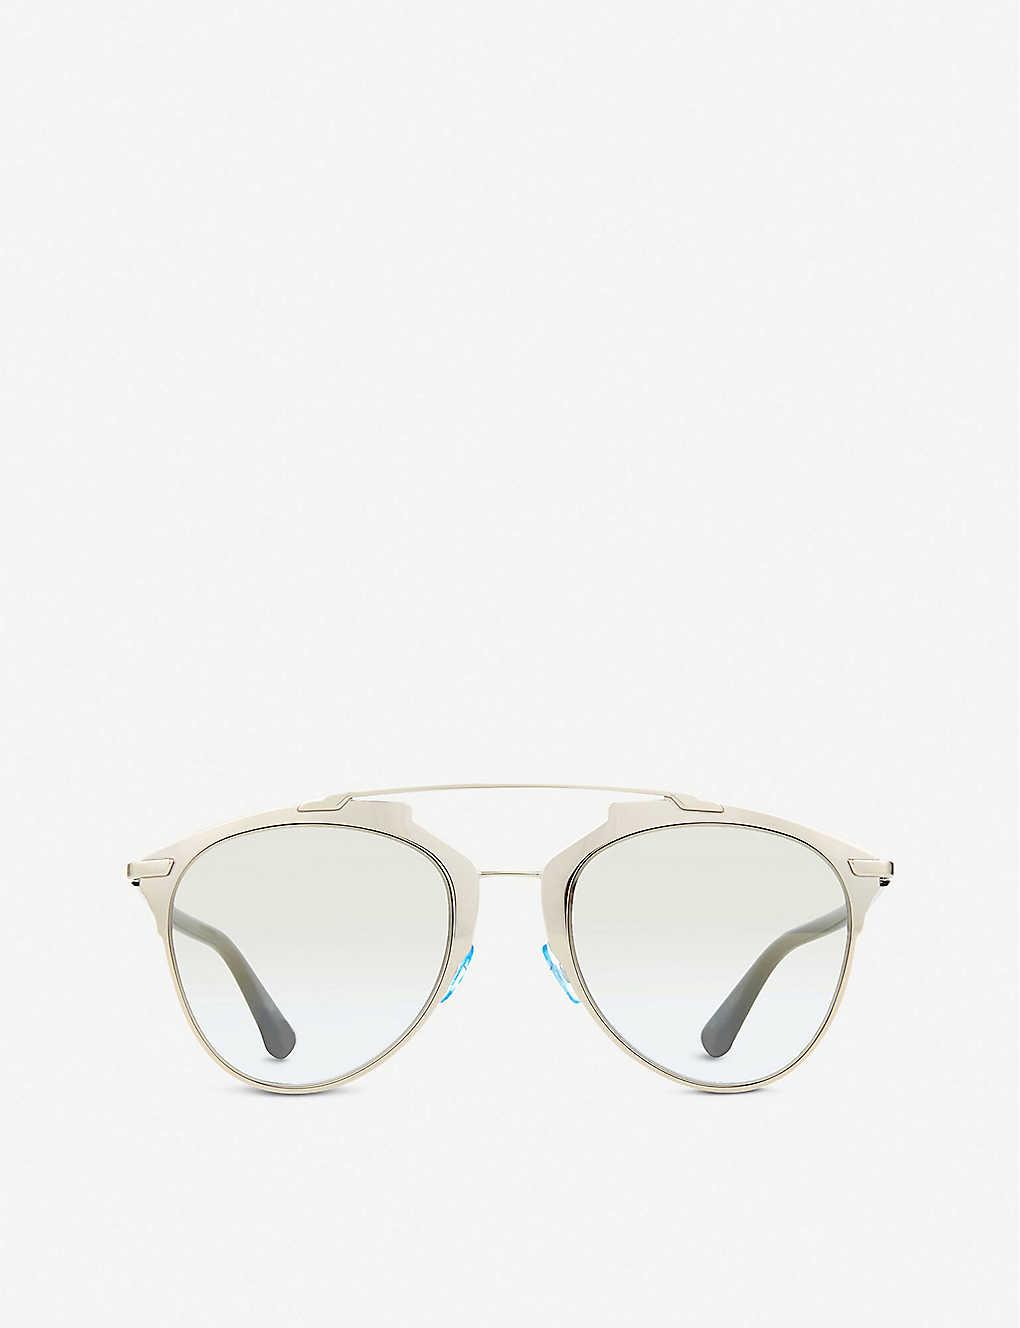 87277a7056be Dior Reflected sunglasses - Black ...